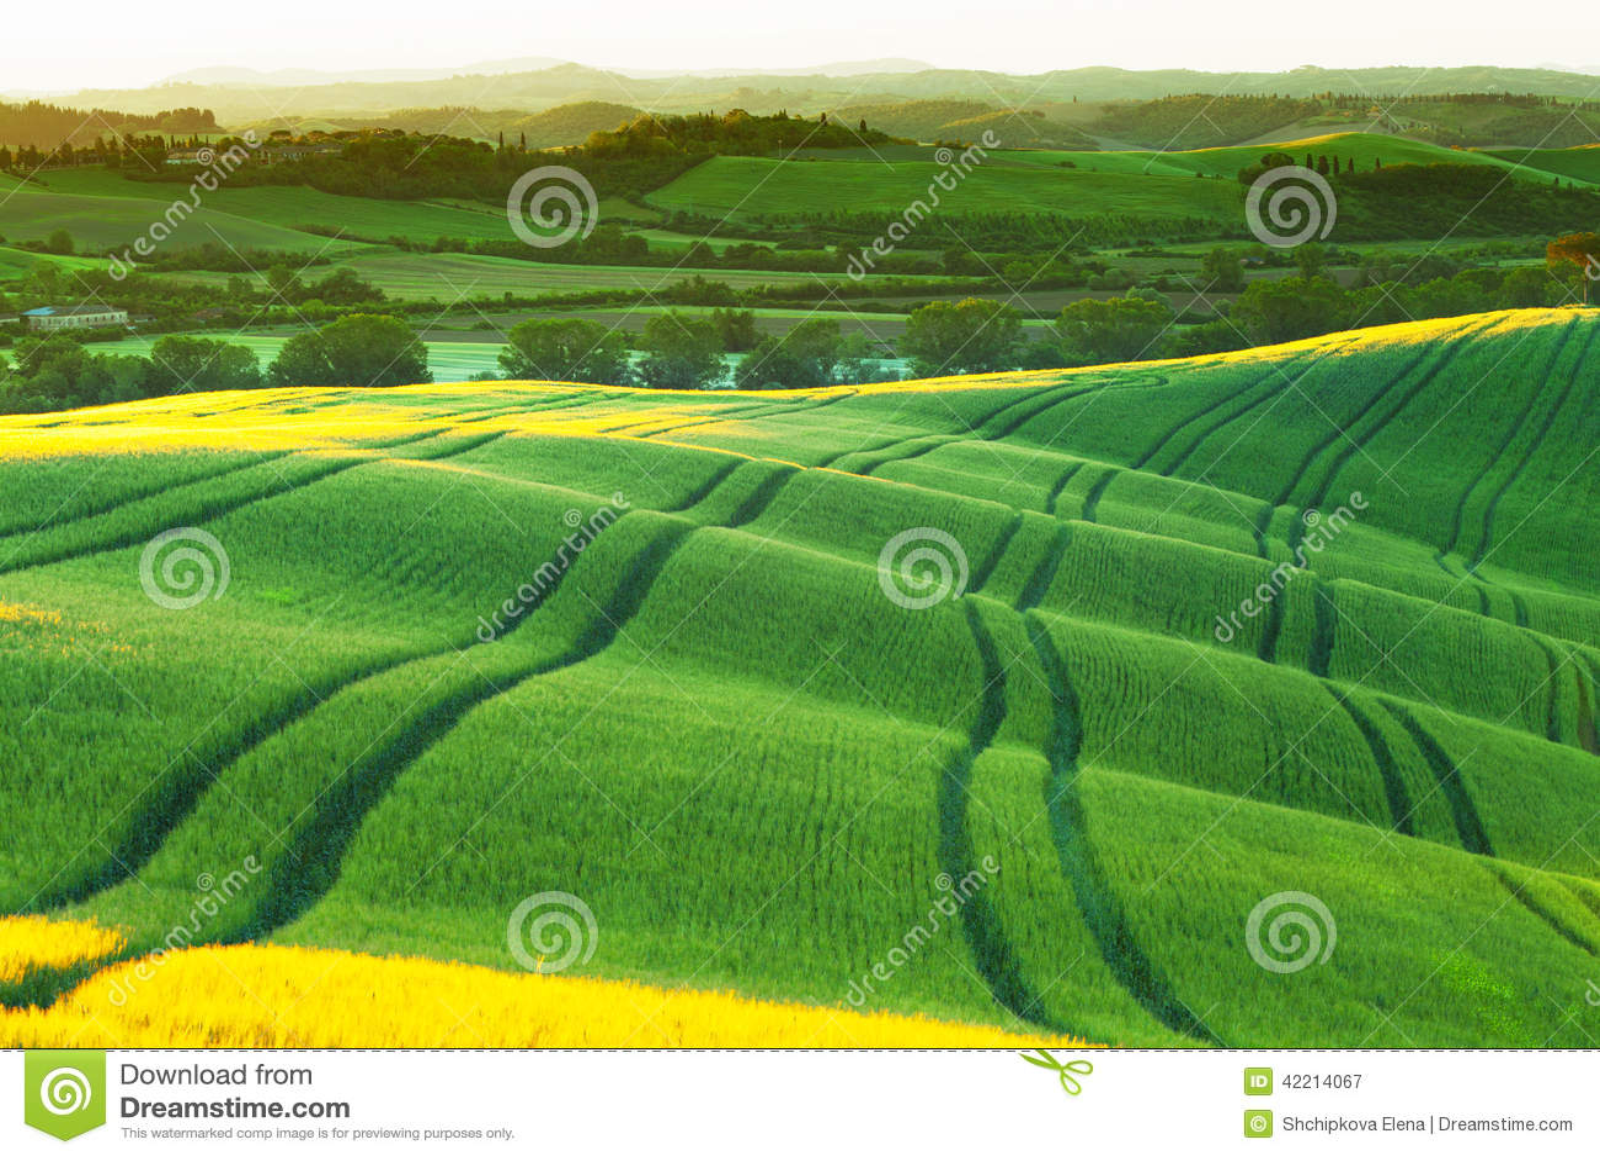 Italian green hills stock photo 92627448 for Green italy